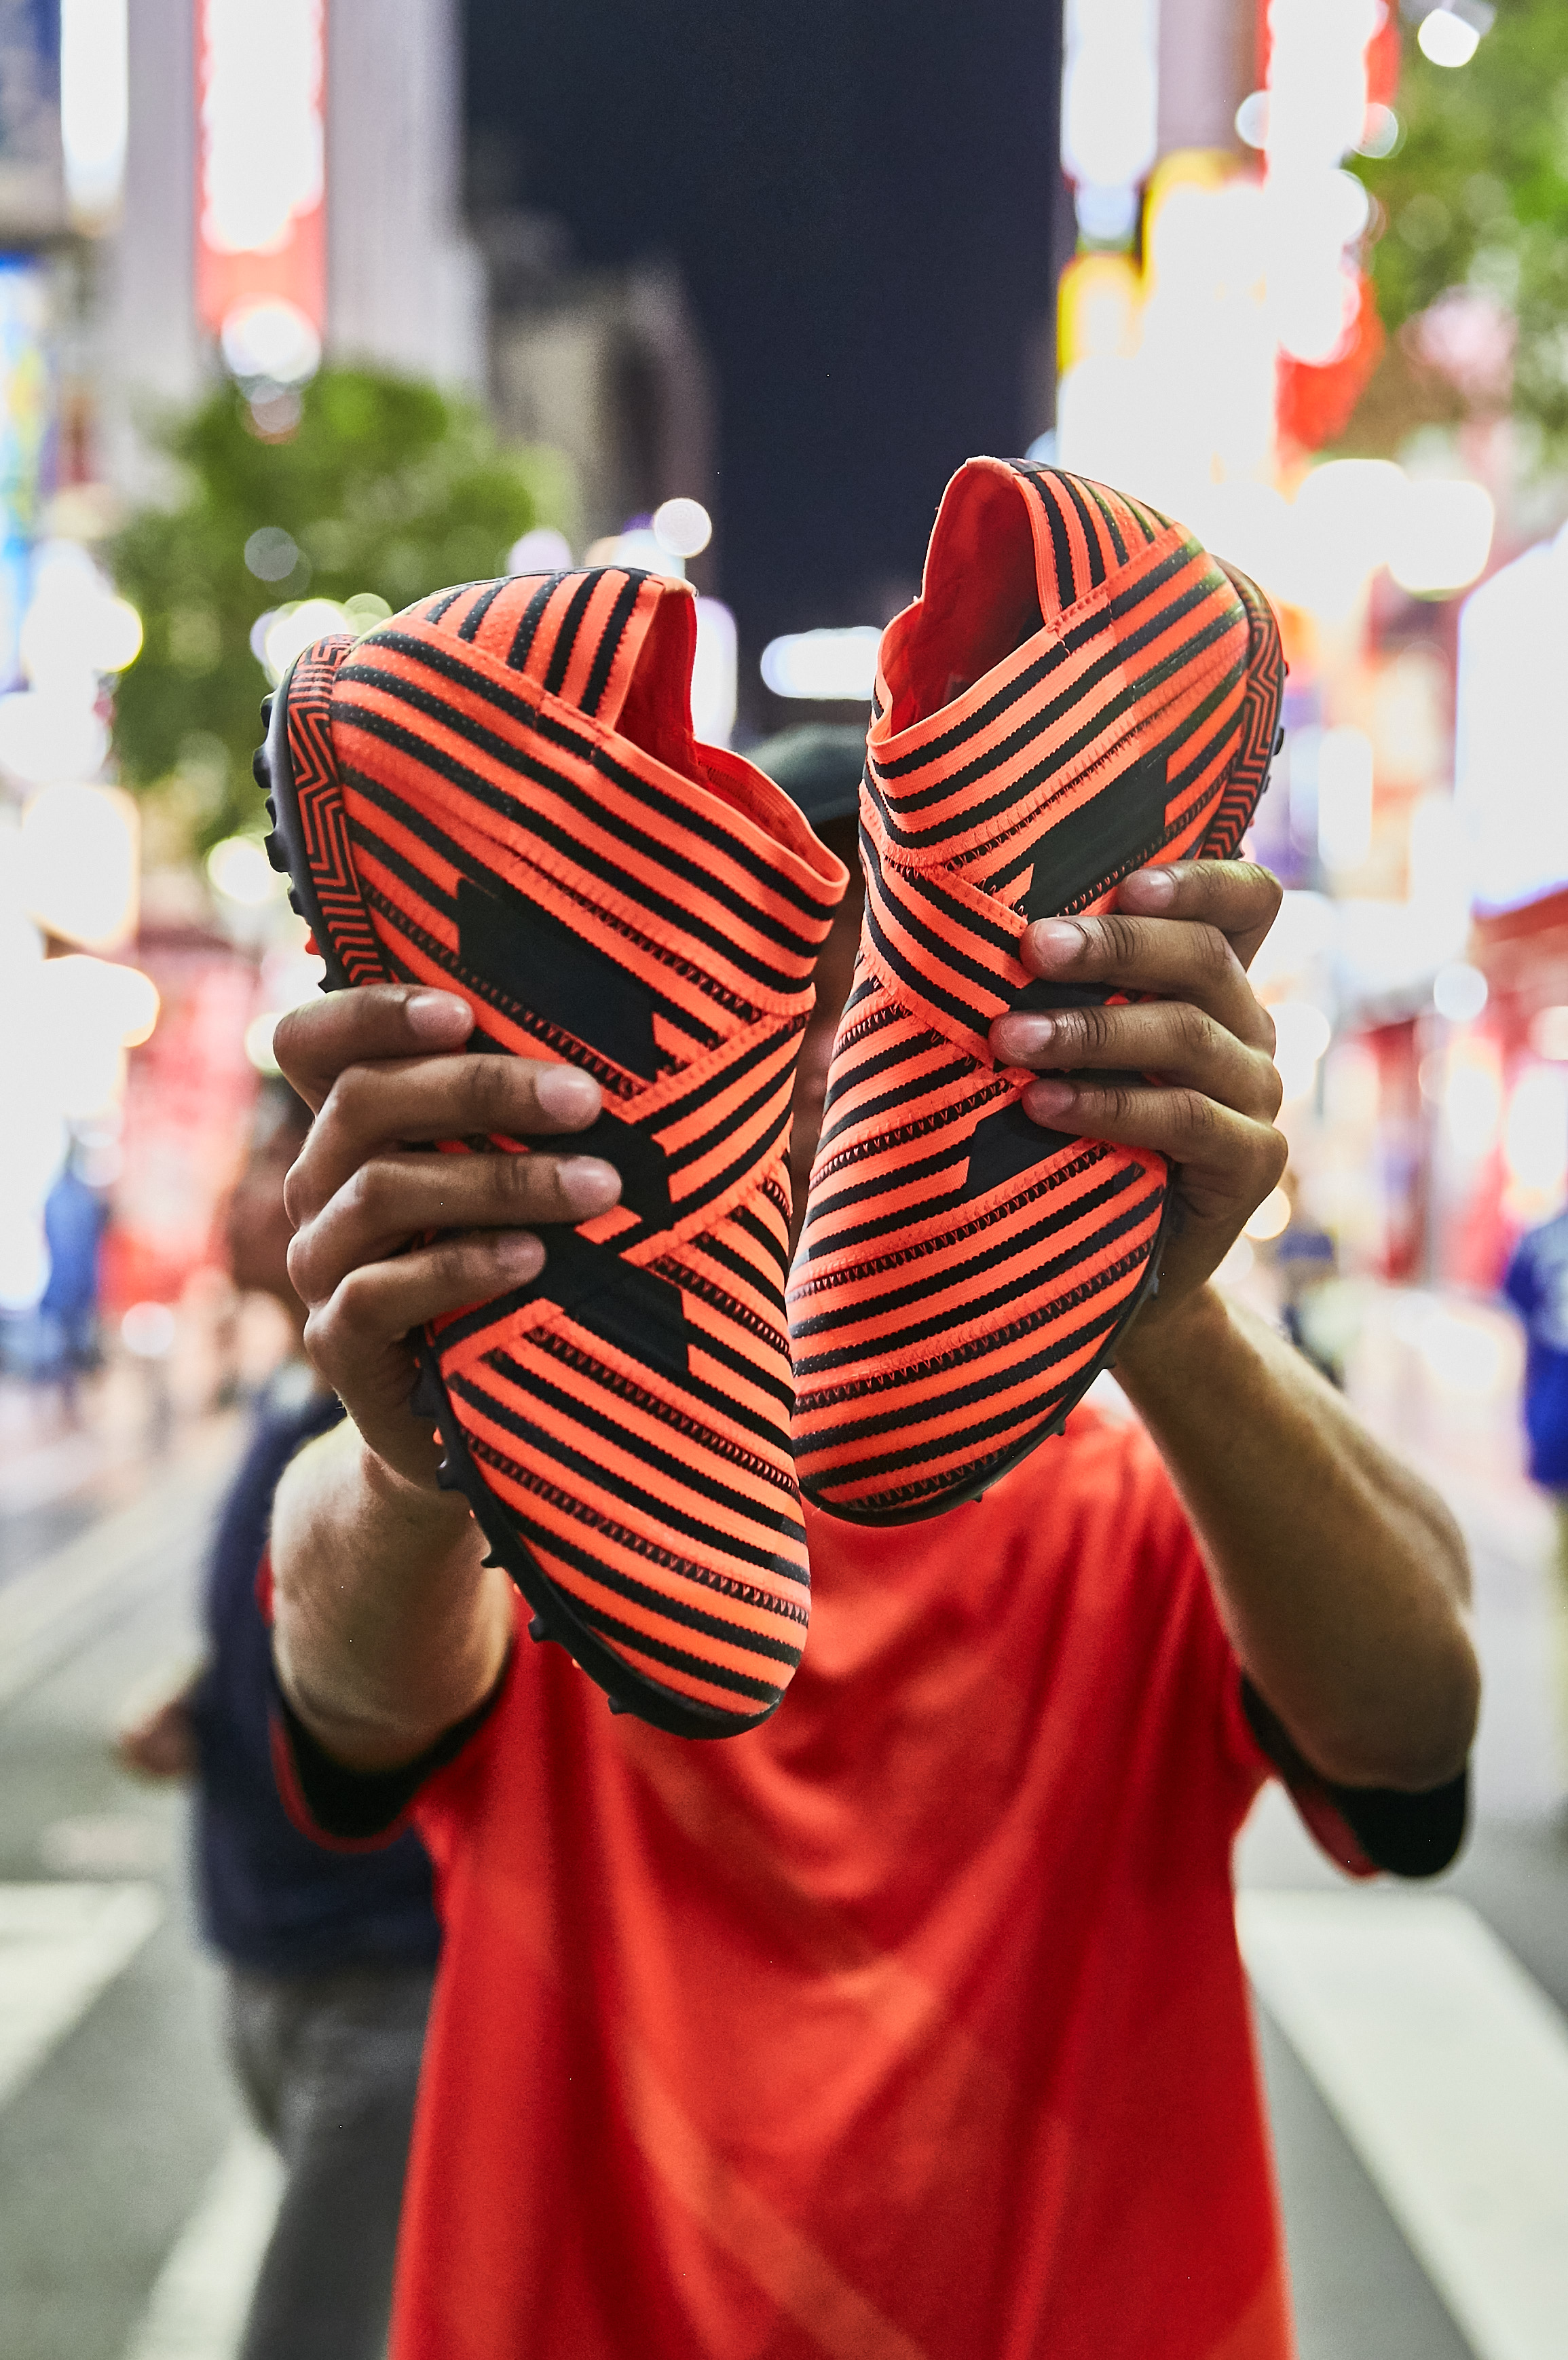 Adidas 2.0 KEYCITY008A3037 1.jpg